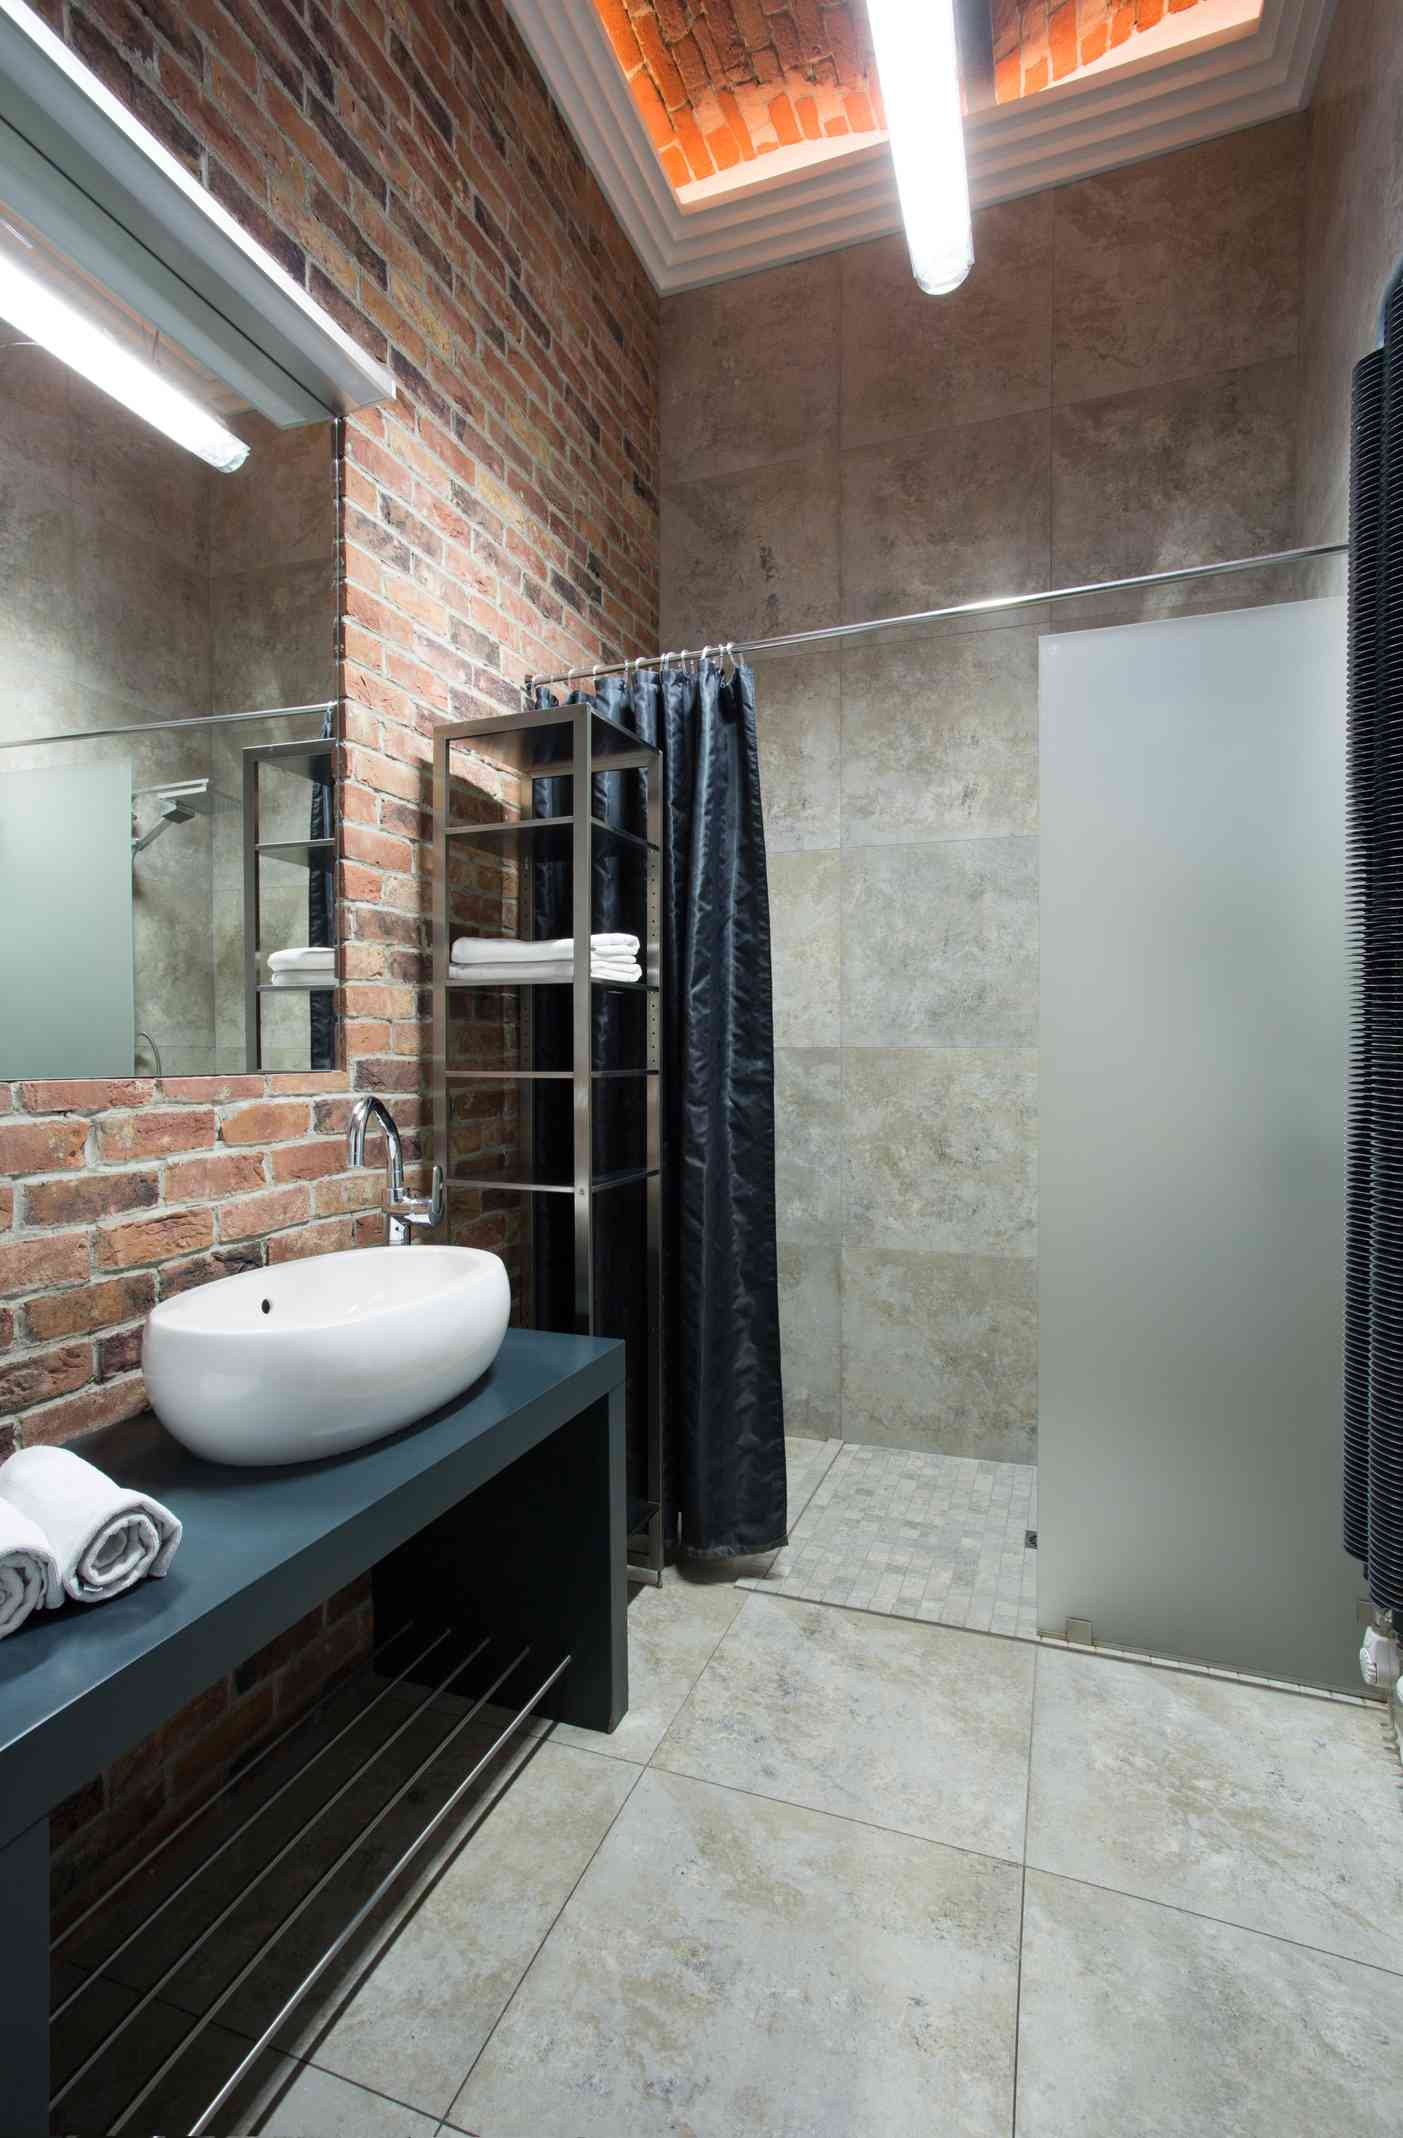 Industrial bathroom with brick